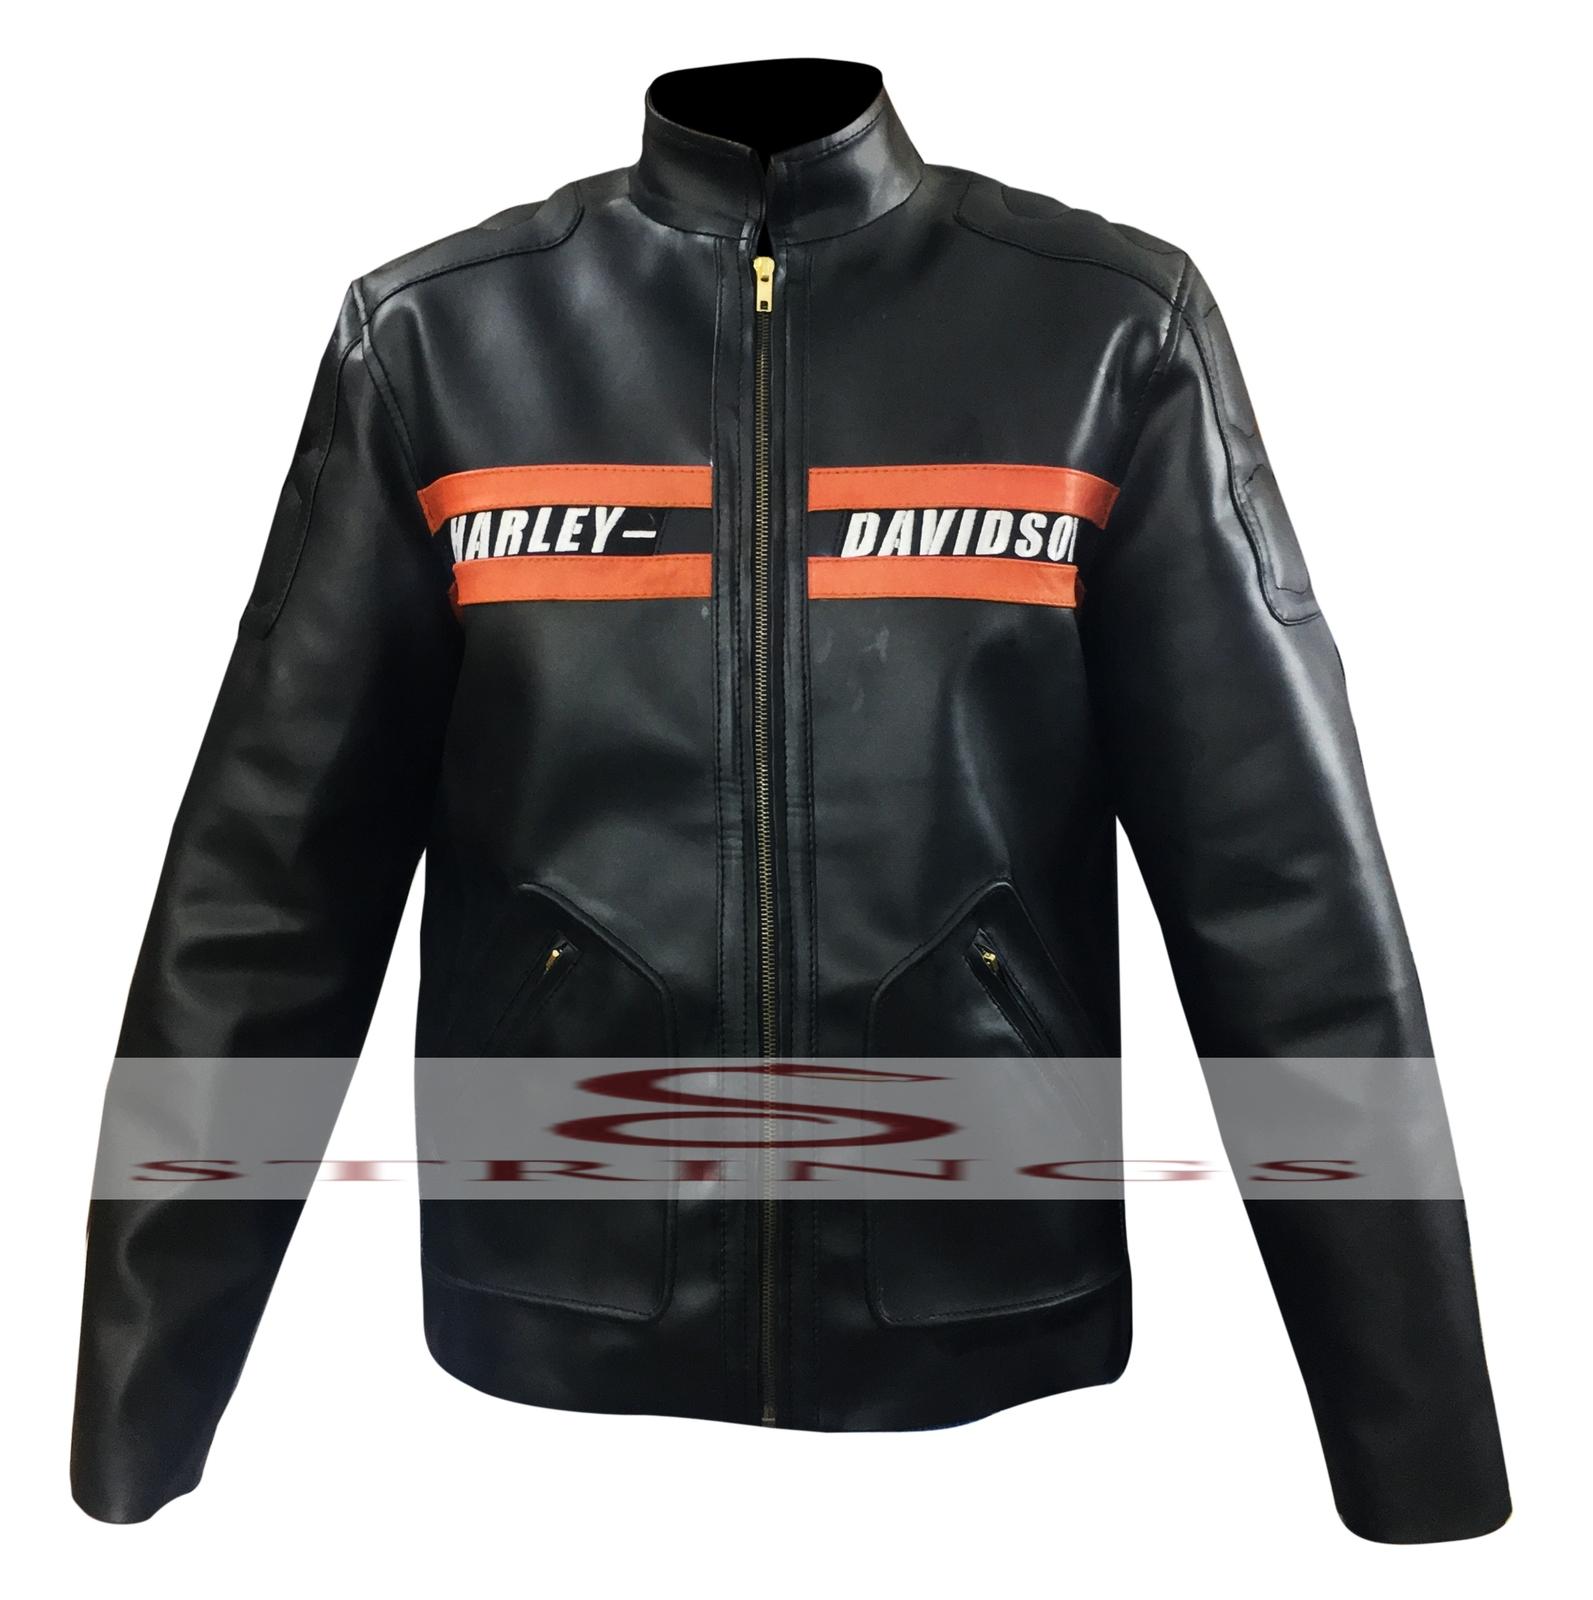 Used leather motorcycle jacket